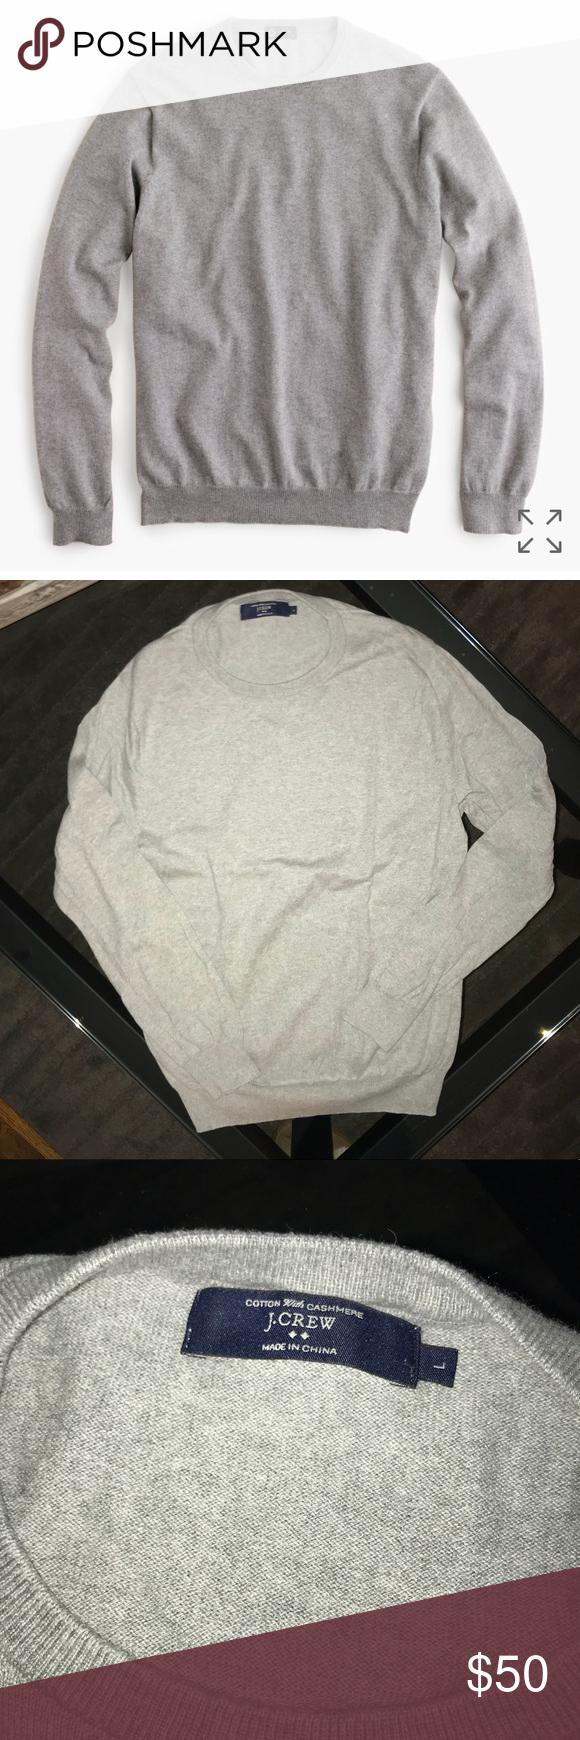 Cotton Cashmere Sweater J. Crew Cotton Cashmere crewneck sweater . Worn once. Perfect condition! J. Crew Sweaters Crewneck